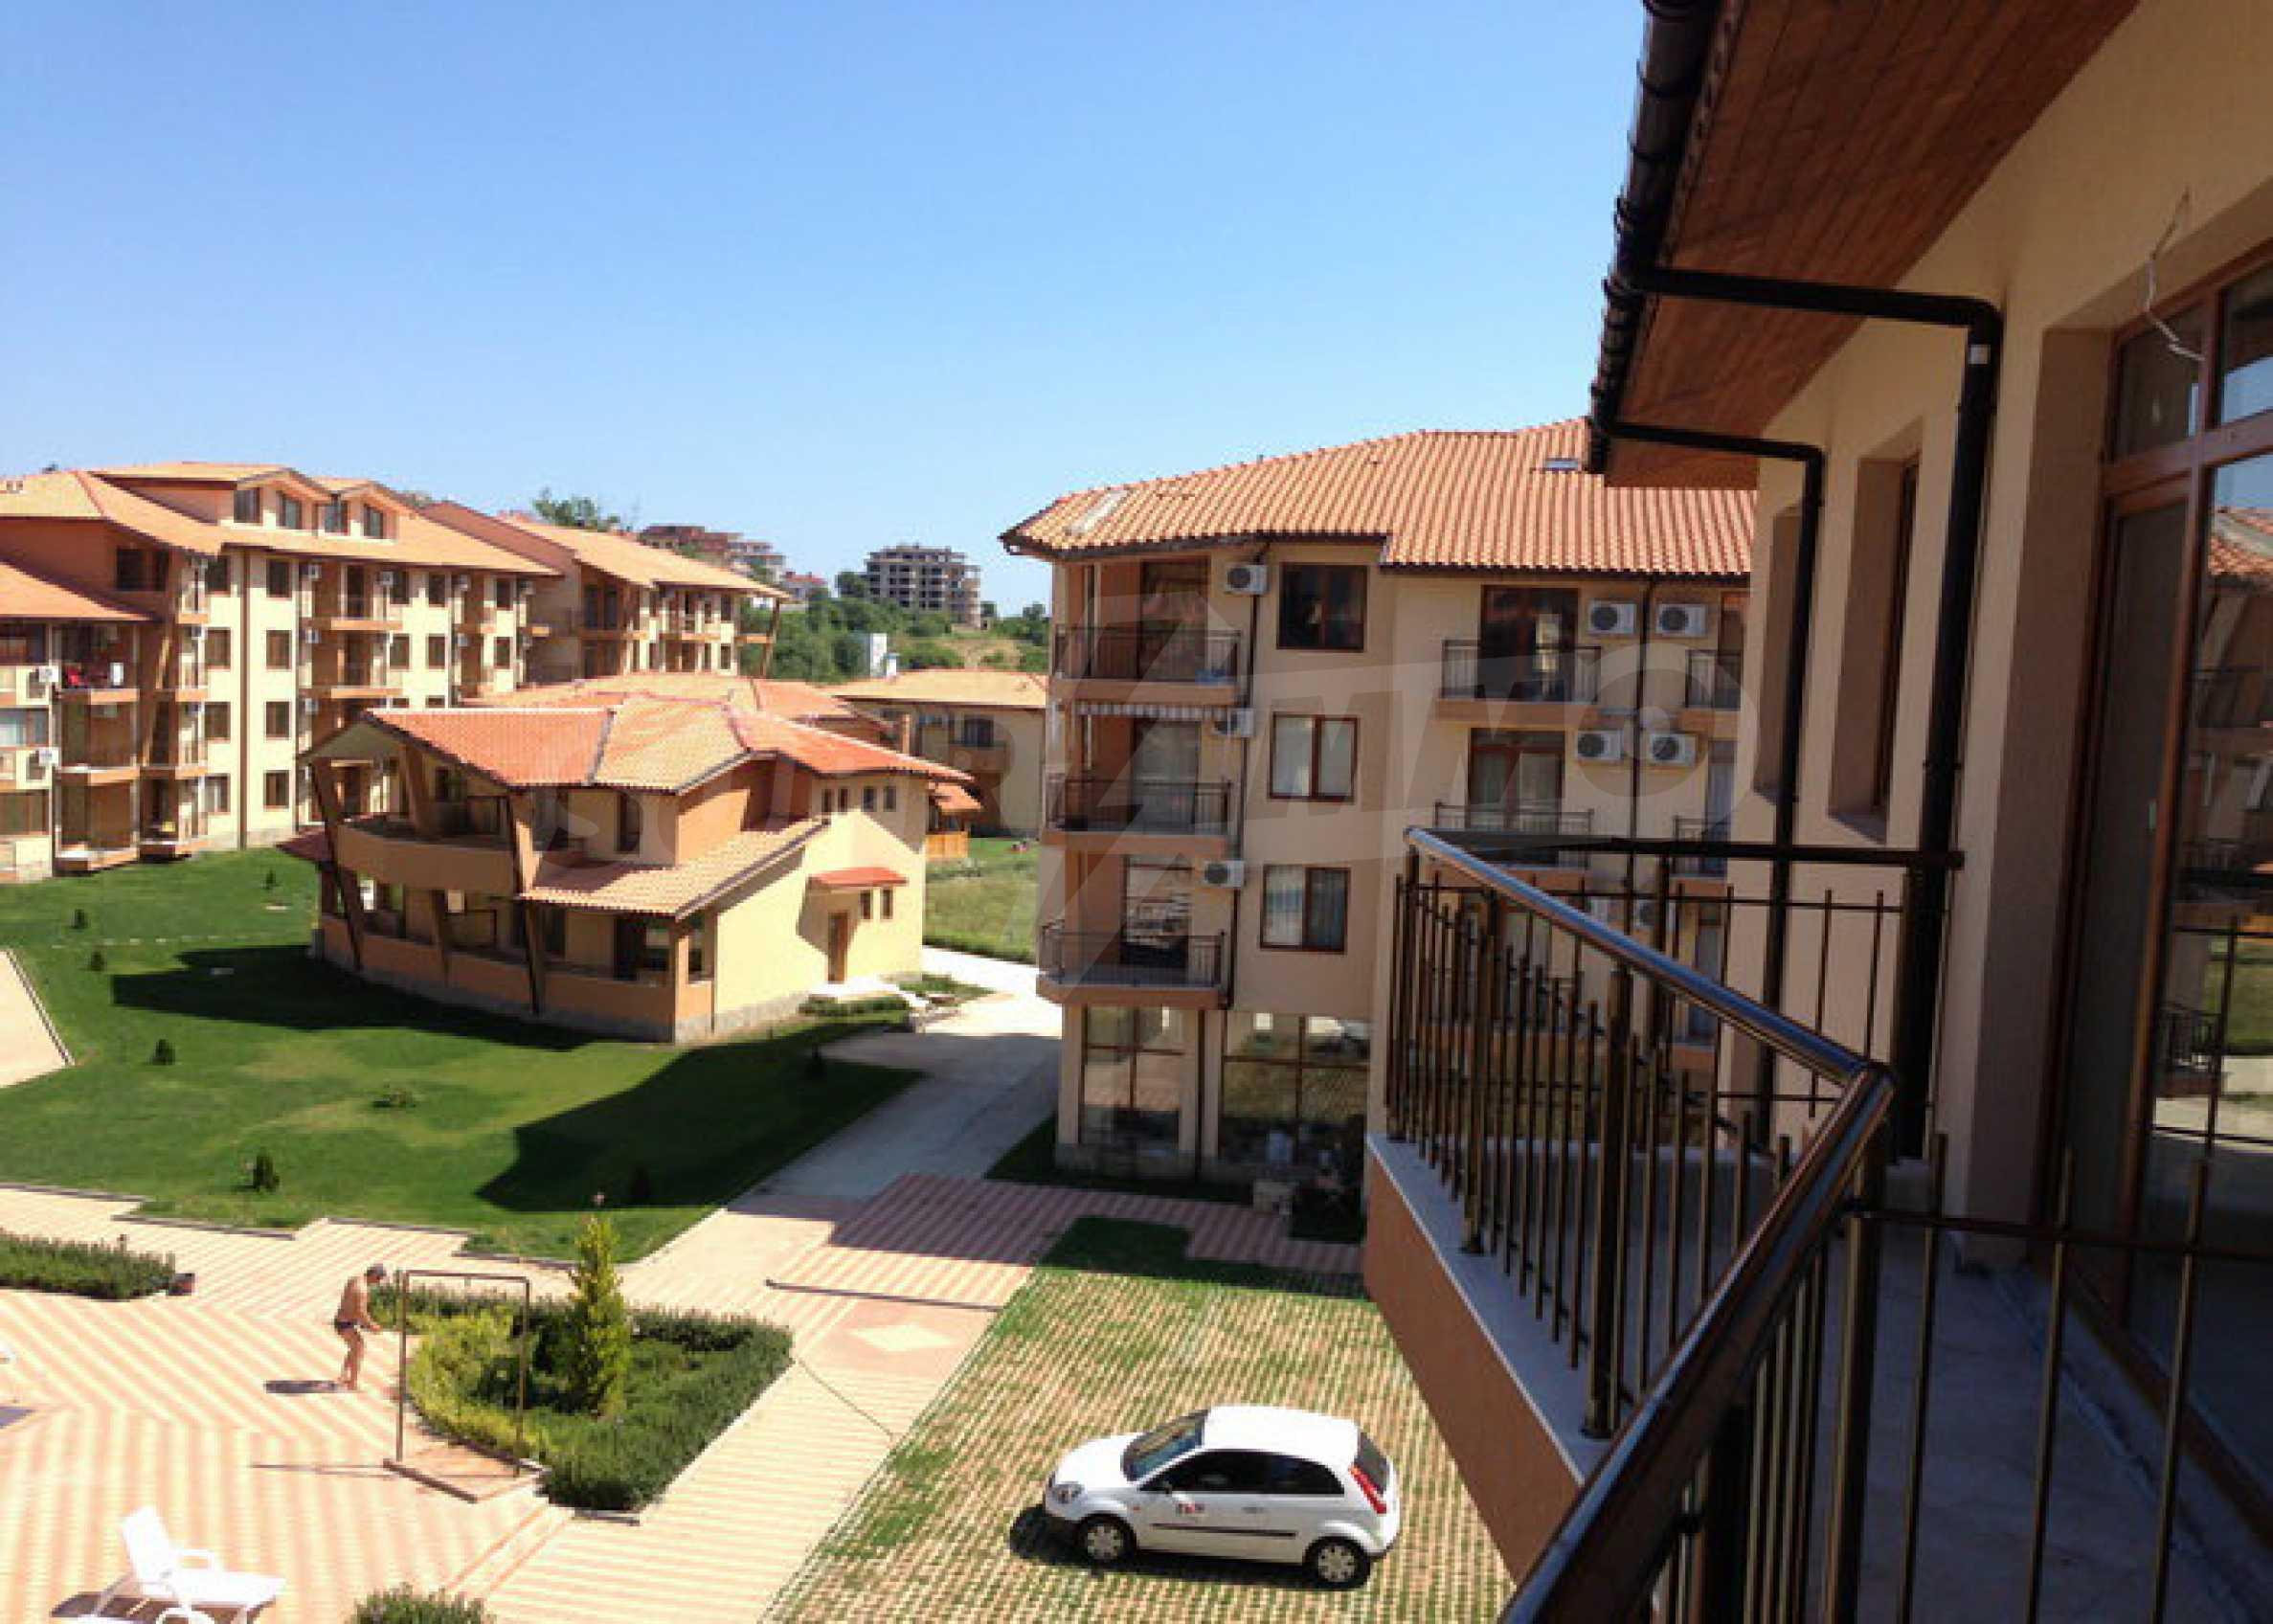 Studios und Apartments im Nestinarka-Komplex in Tsarevo 2